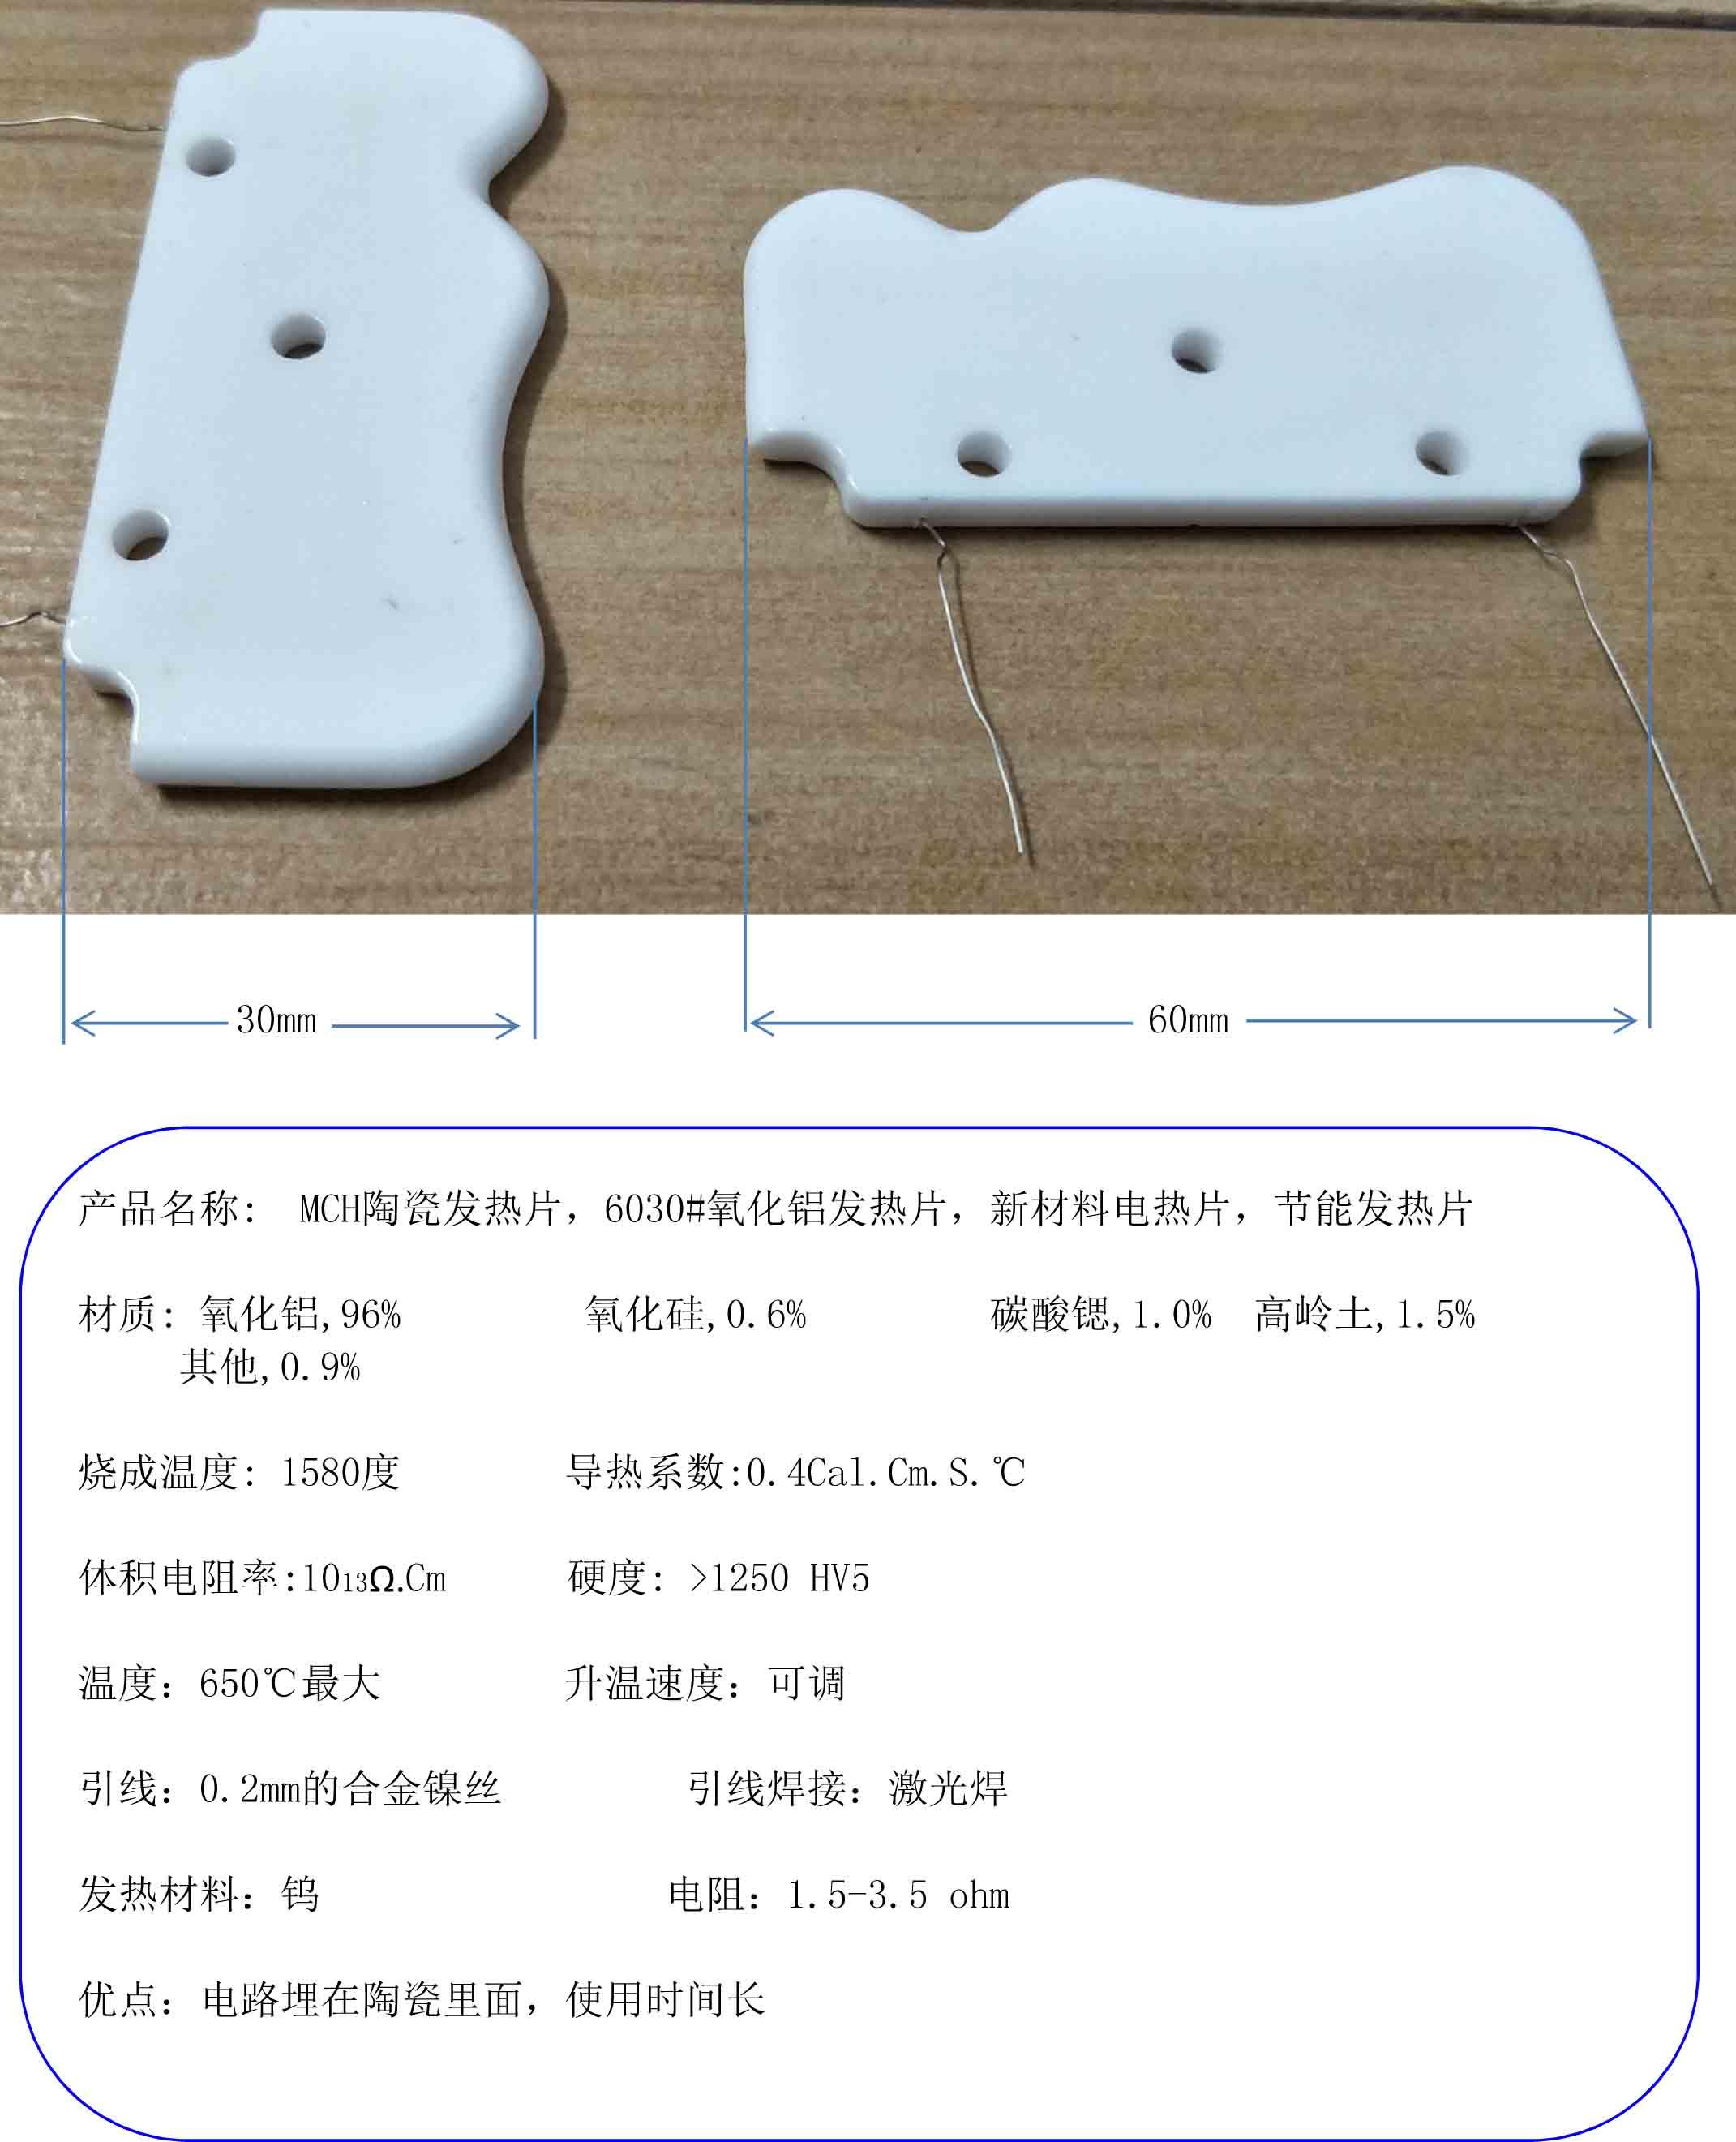 MCH ceramic heating sheet, 6030# alumina heating sheet, new material electric heating sheet, energy saving heating sheet mystery mch 1025